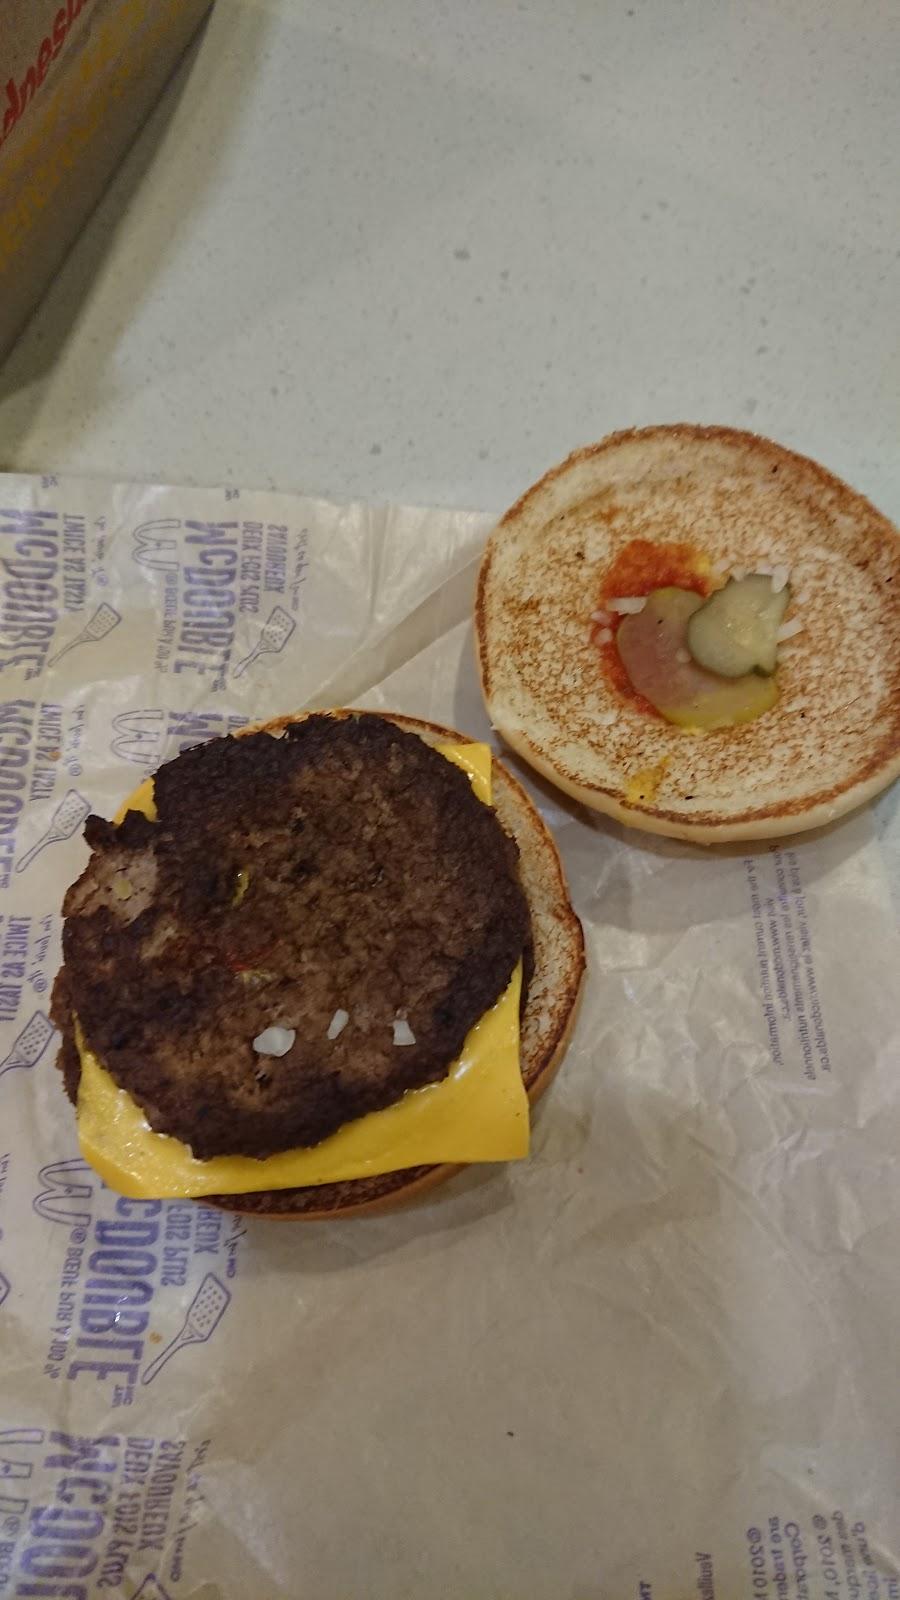 McDonalds | cafe | 120 Thames St N, Ingersoll, ON N5C 4B1, Canada | 5194850850 OR +1 519-485-0850